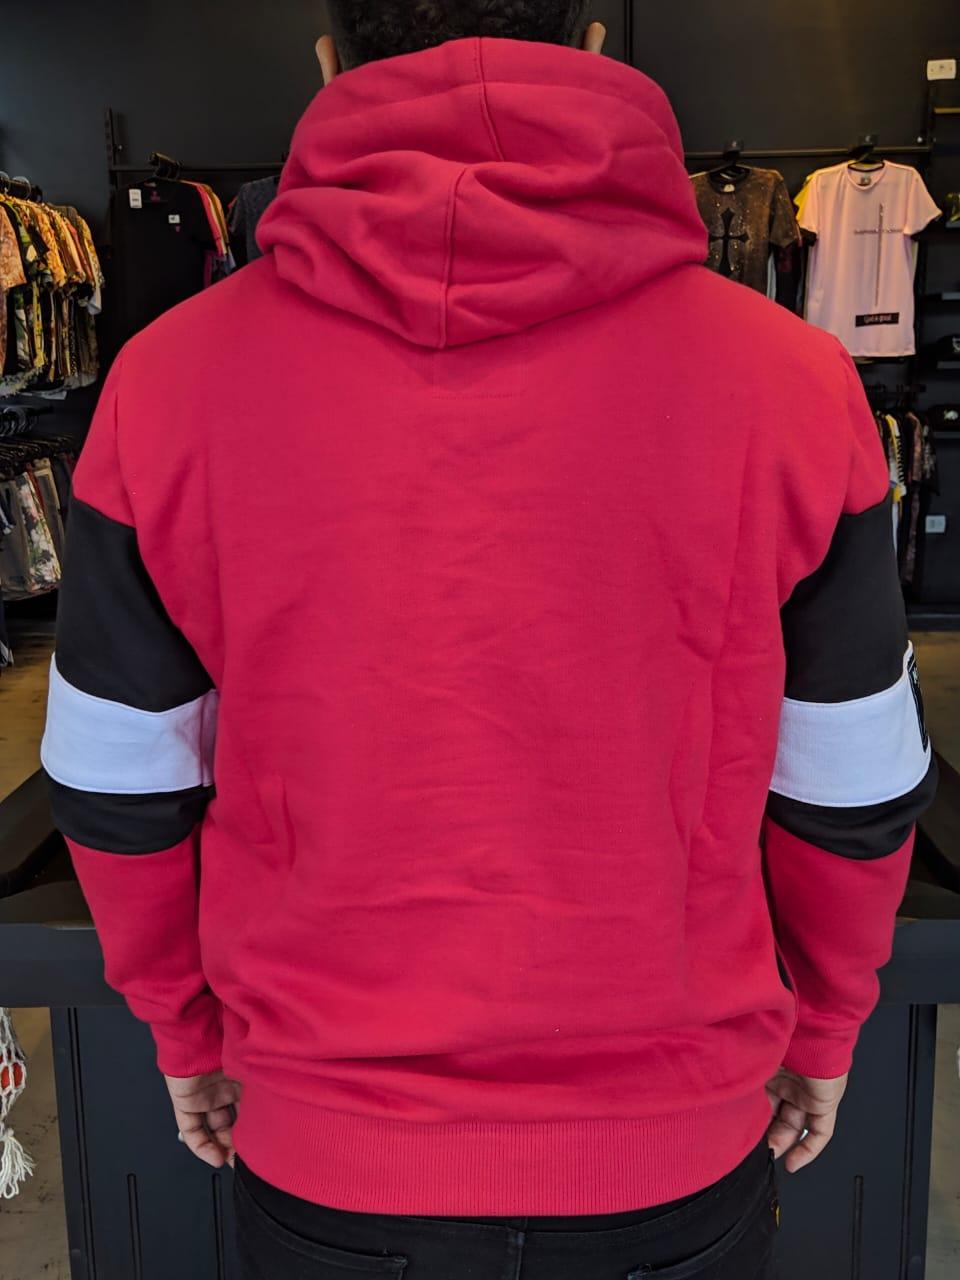 Blusa Moletom Kawippi Vermelha Faixa  - Harpia Moda - Moda Masculina & Acessórios